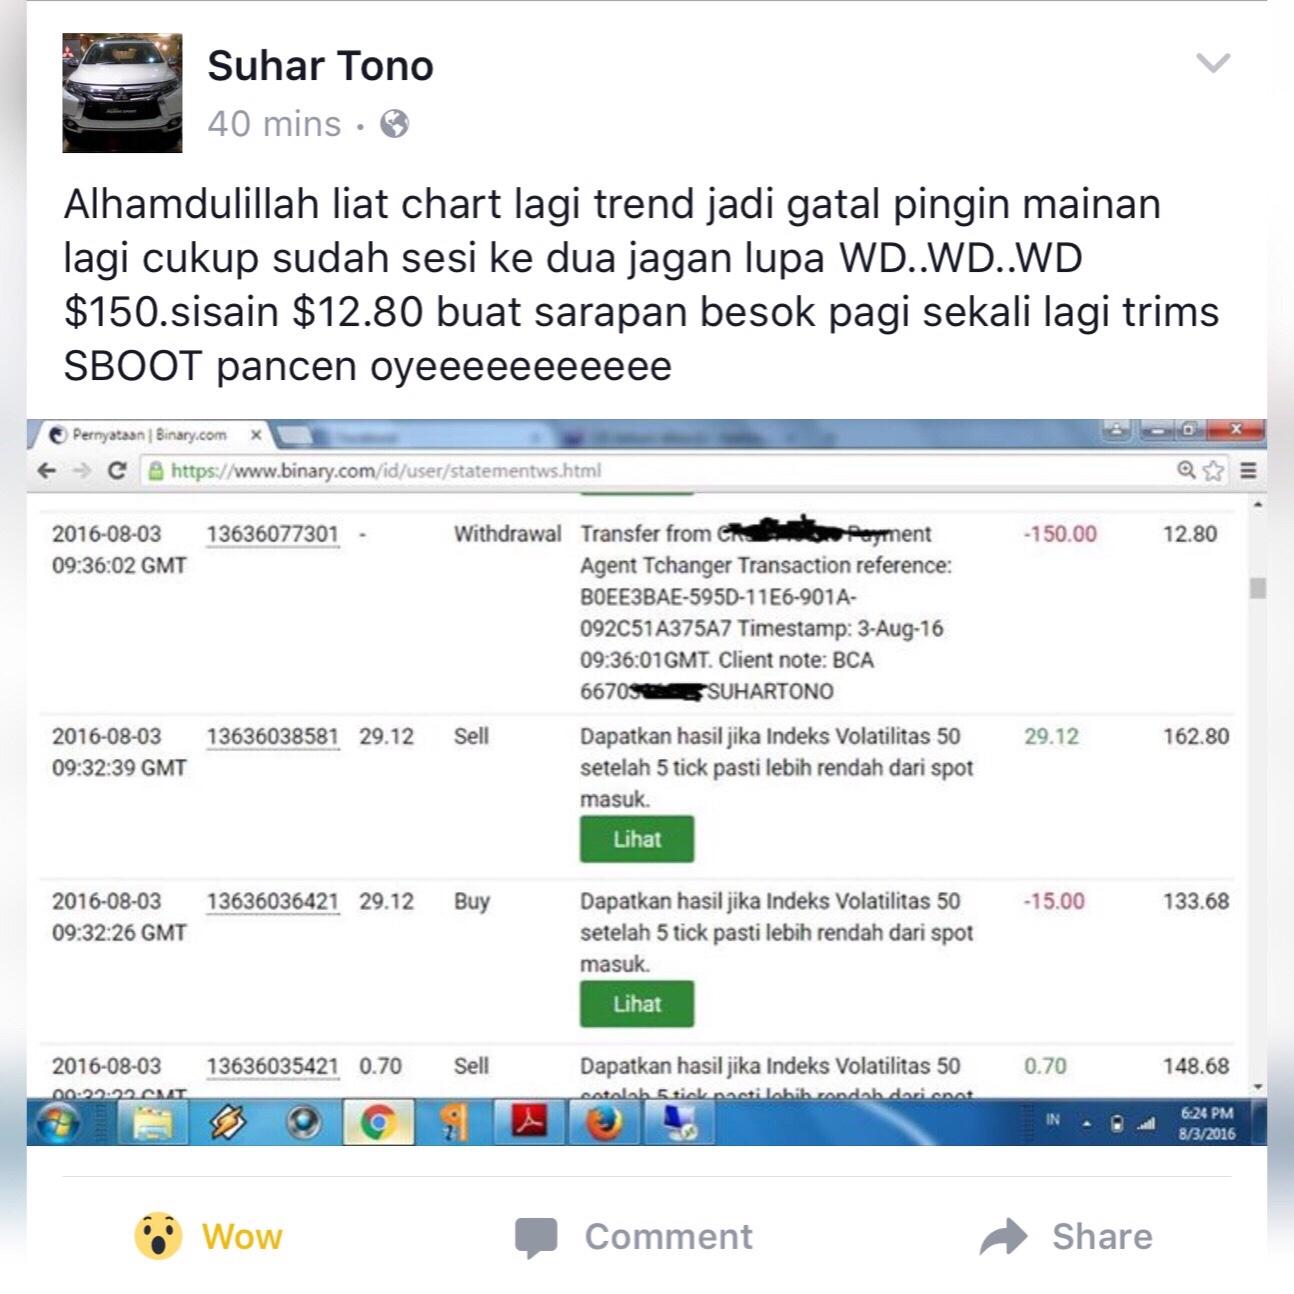 Smart Binary Bot (SBBOT) - Suhartono